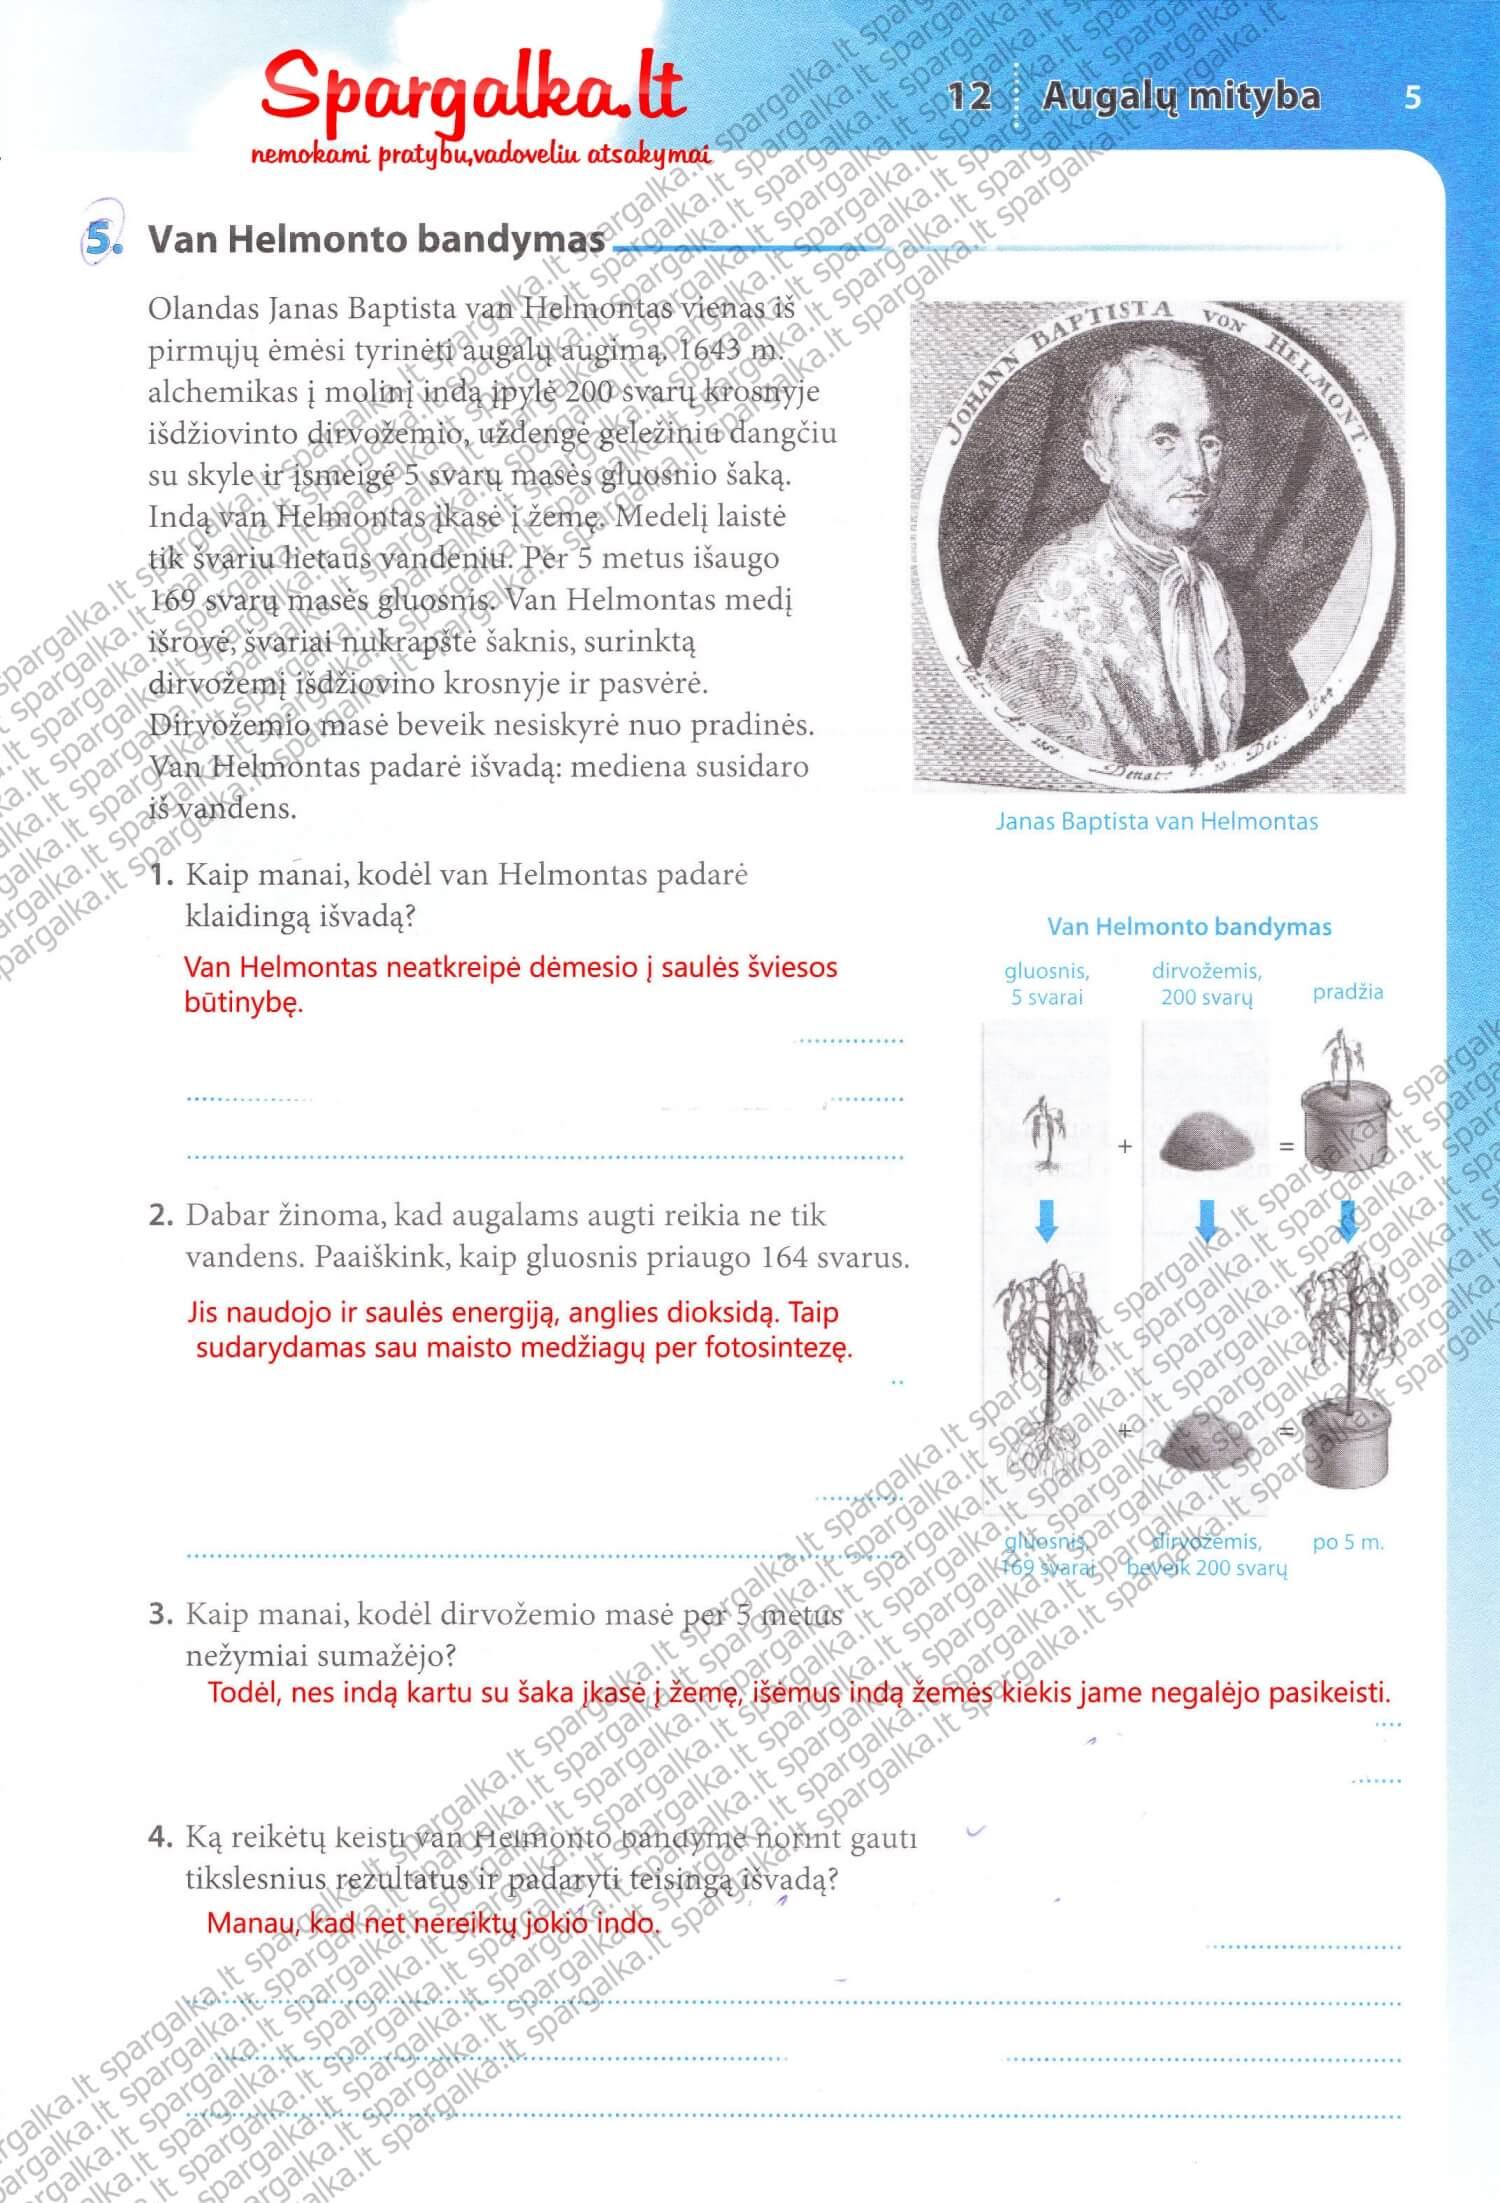 Biologija Tau 2 dalis pratybos